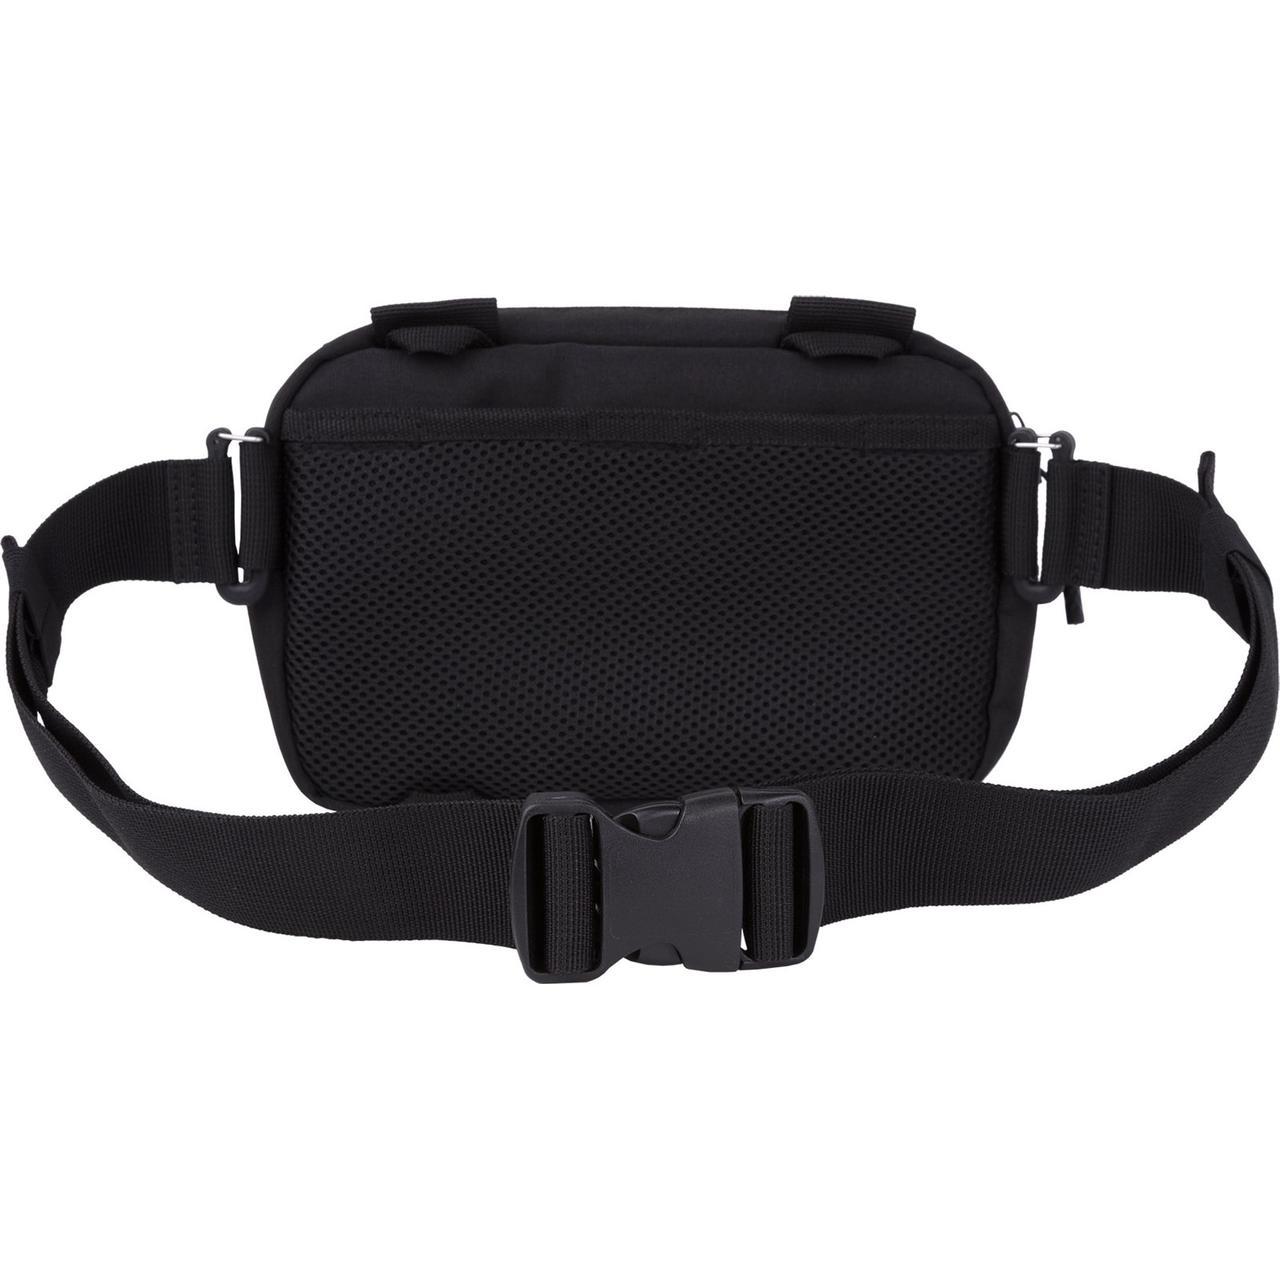 Поясная сумка ASUS ROG Ranger BC1001 Waist Pack, 90XB06FA-BME000 - фото 2